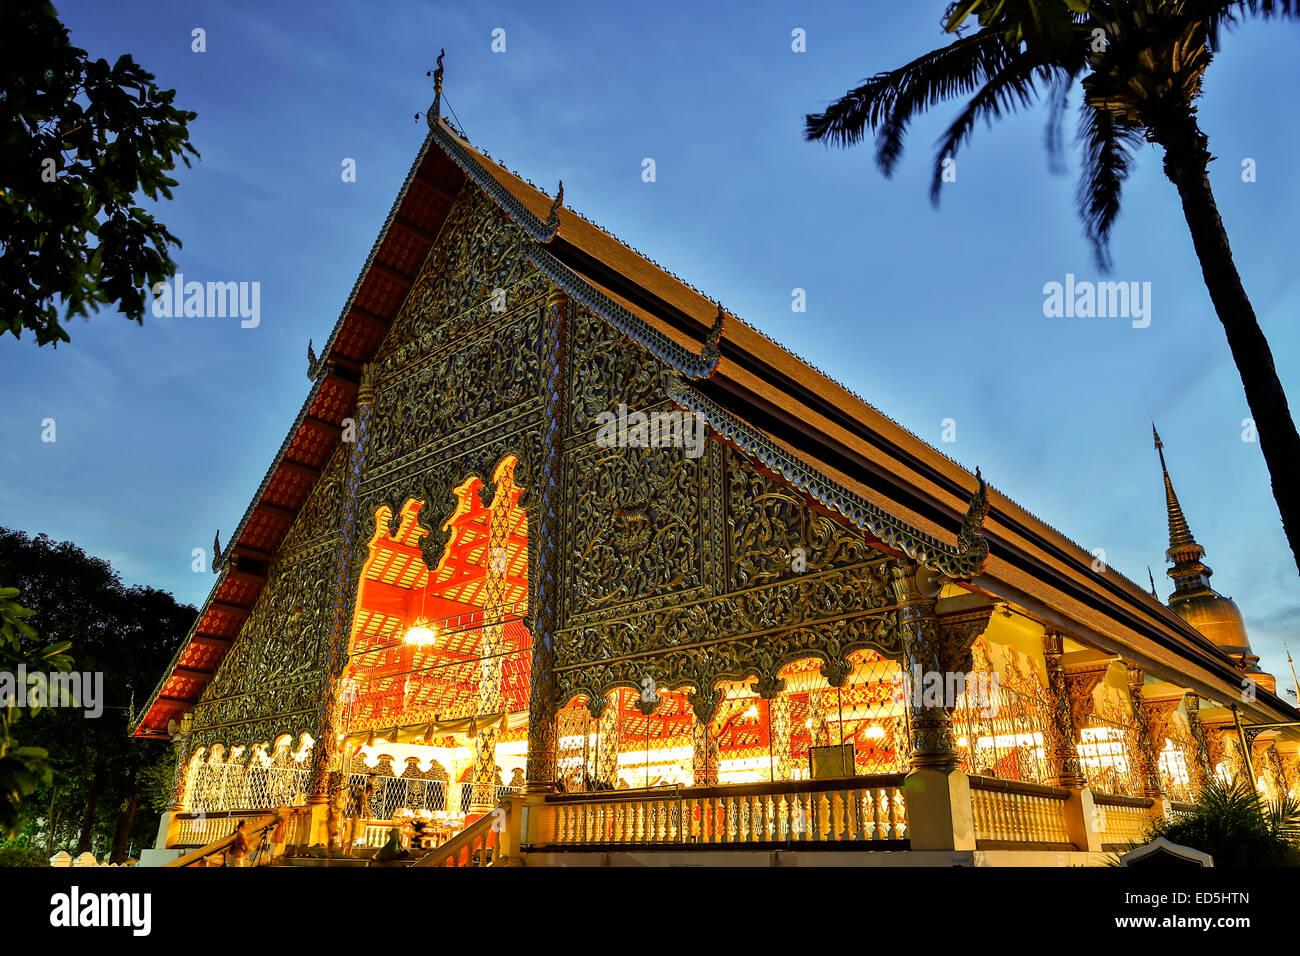 Prayer hall, Wat Suan Dok, Chiang Mai, Thailand - Stock Image